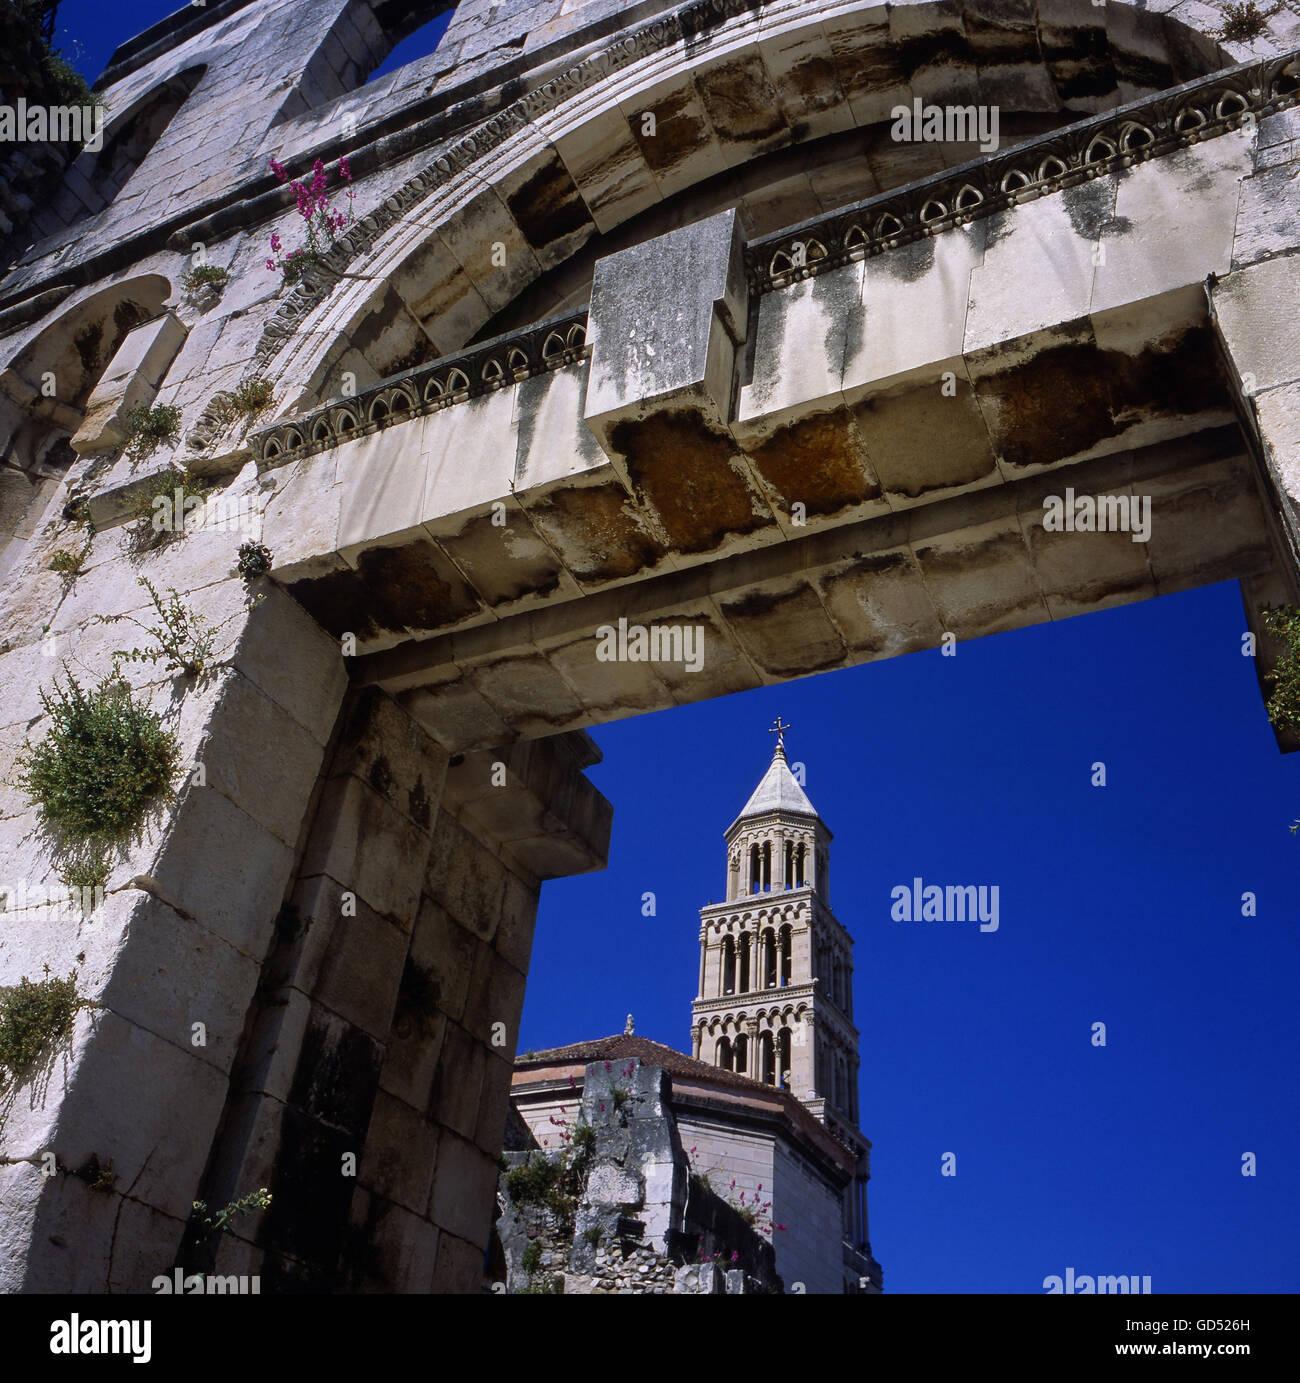 Kathedrale Sveti Duje Im Diokletianspalast, Fernsehreihe, Split, UNESCO Weltkulturerbe, Europa Stockbild